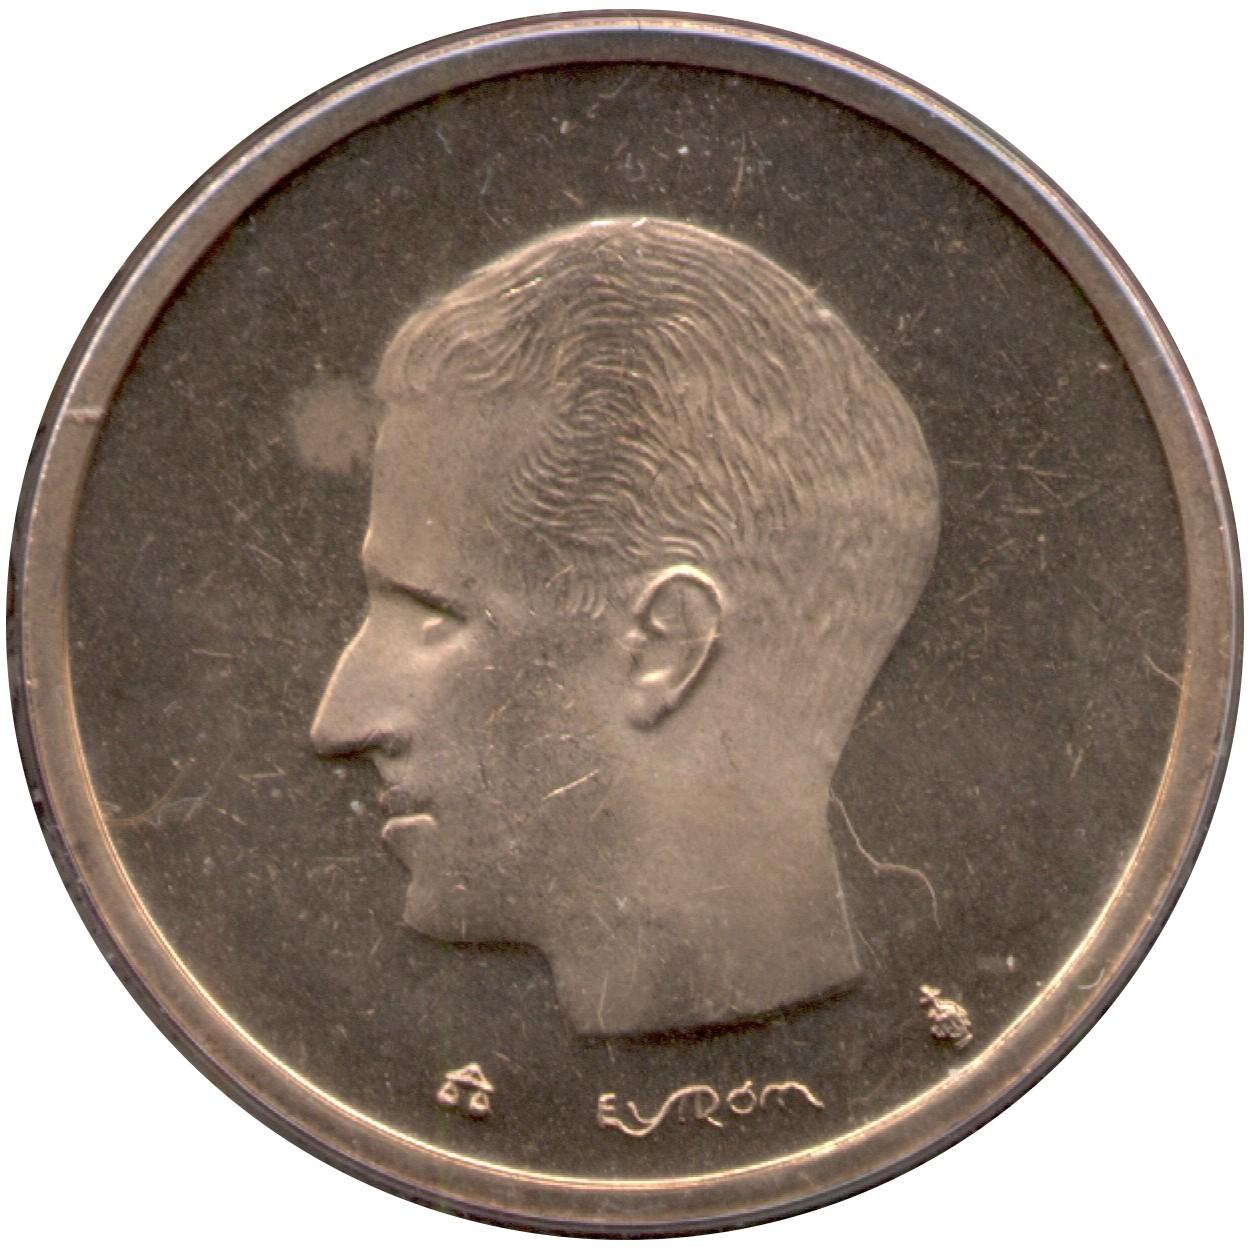 Belgium 20 Francs (1980-1993 Baudouin I)